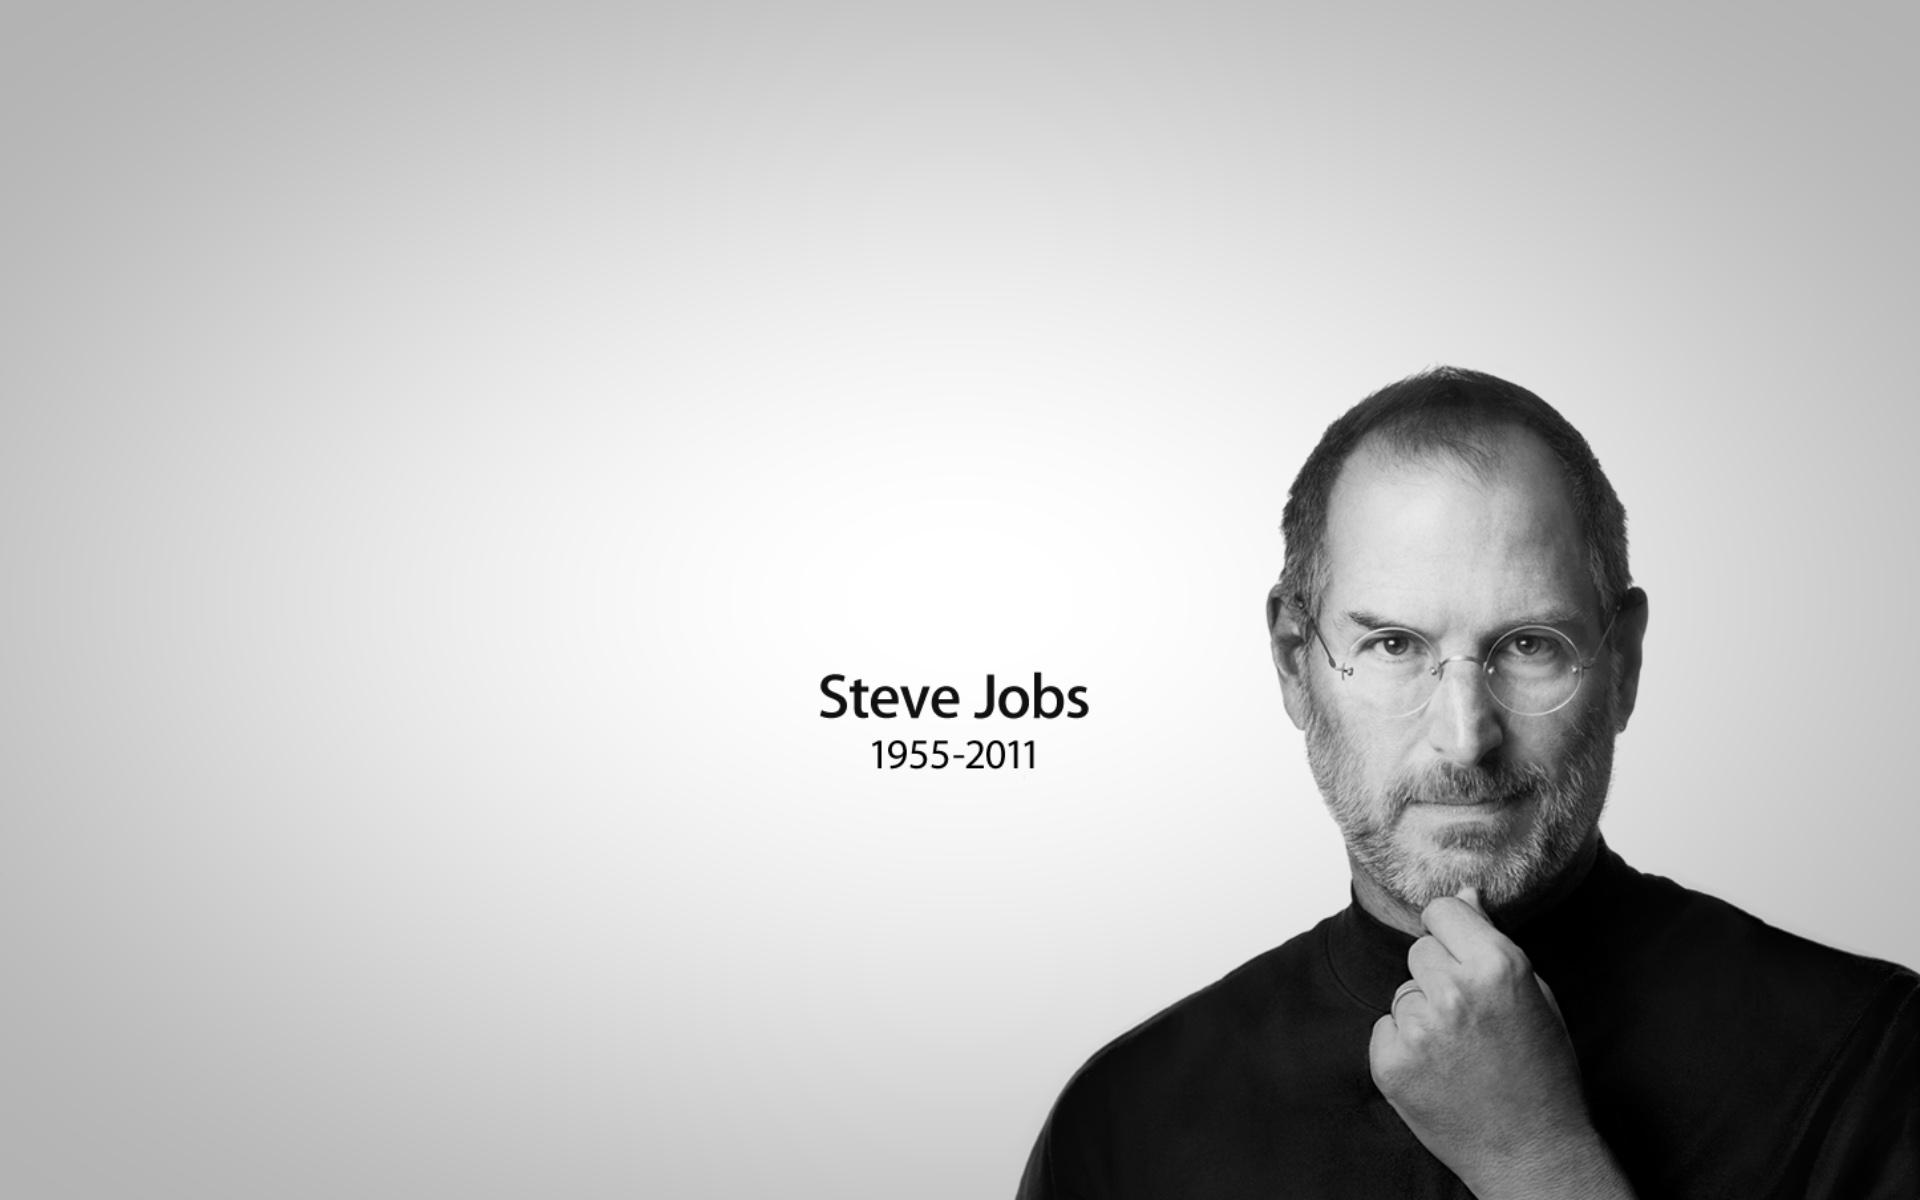 Steve Jobs Wallpapers HD Wallpapers 1920x1200